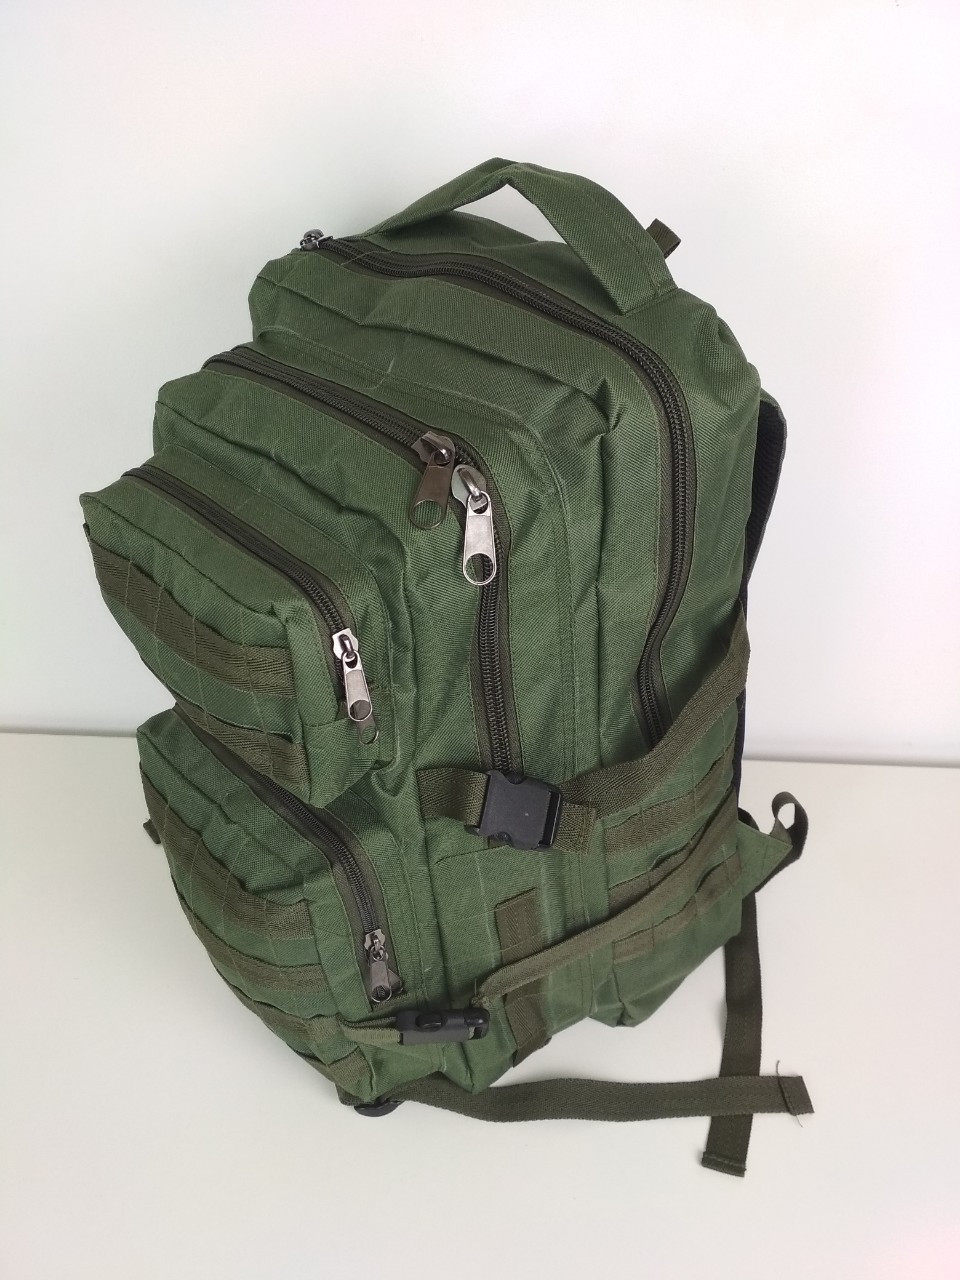 Рюкзак армейский Тактик размер 55x38x25